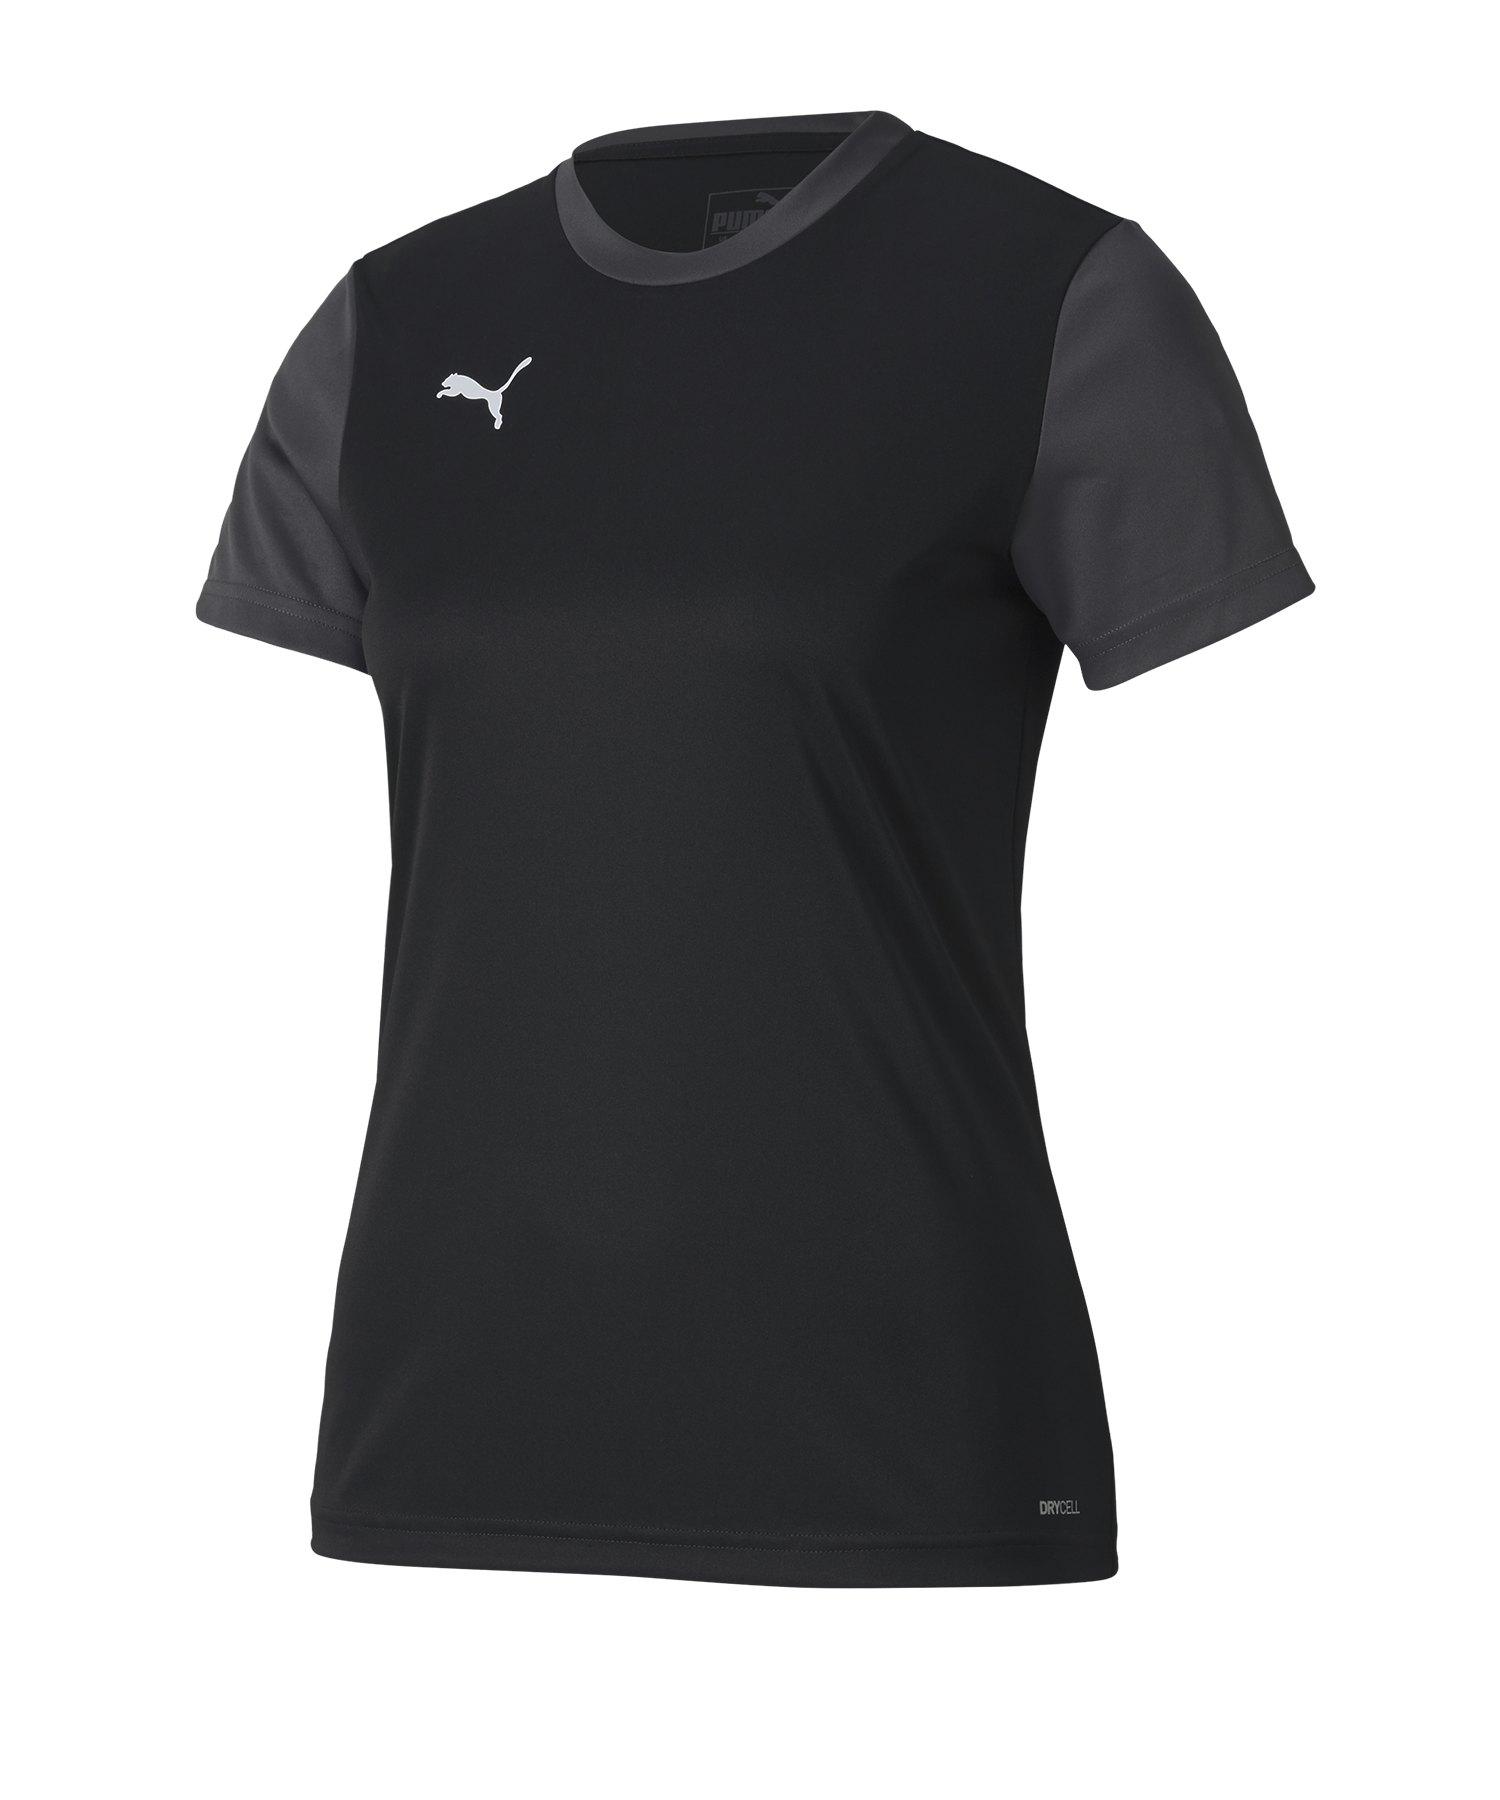 PUMA teamGOAL 23 Sideline Tee T-Shirt Damen F03 - schwarz